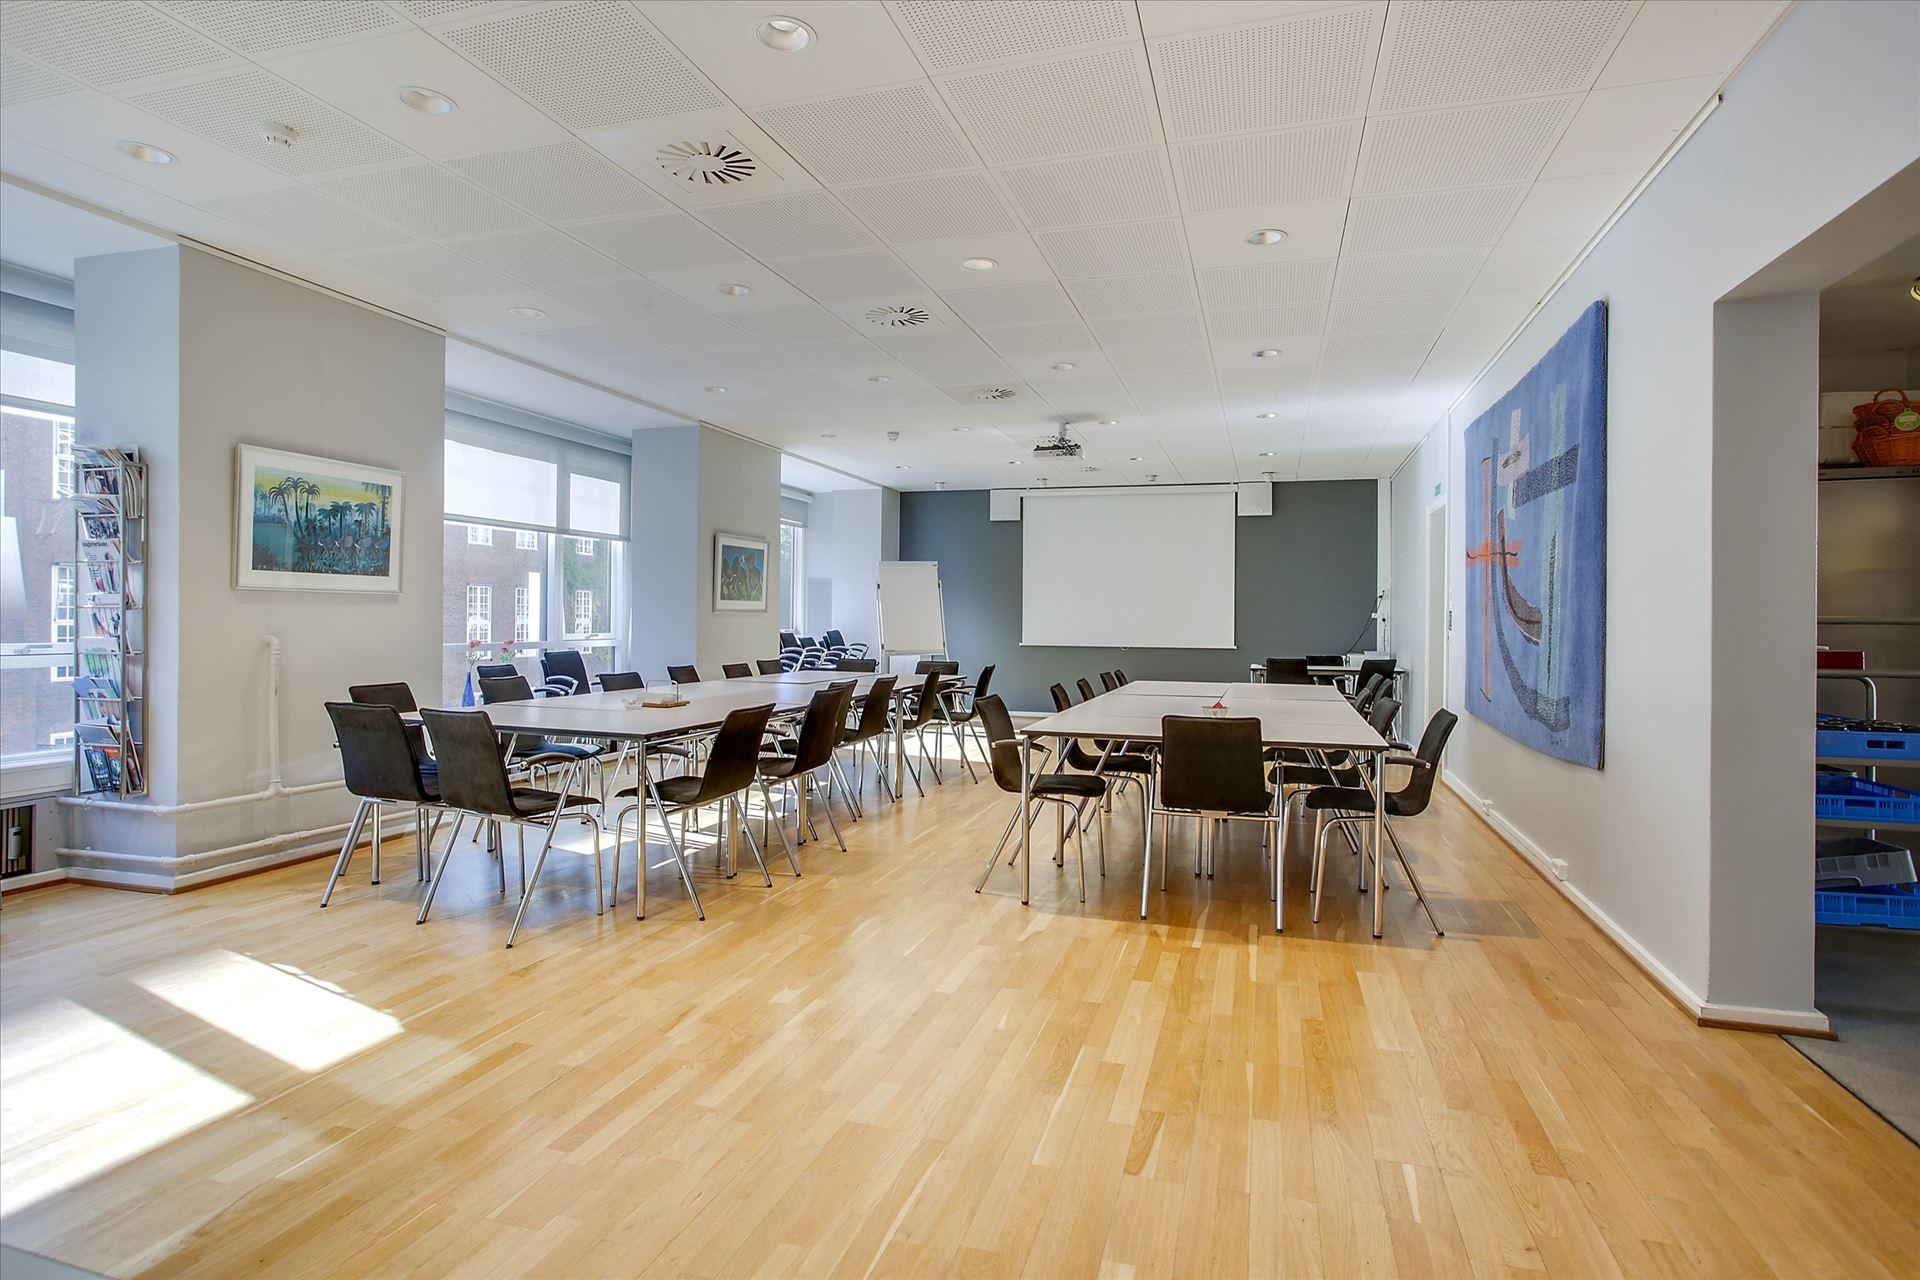 440 / 500 / 940 m² kontor